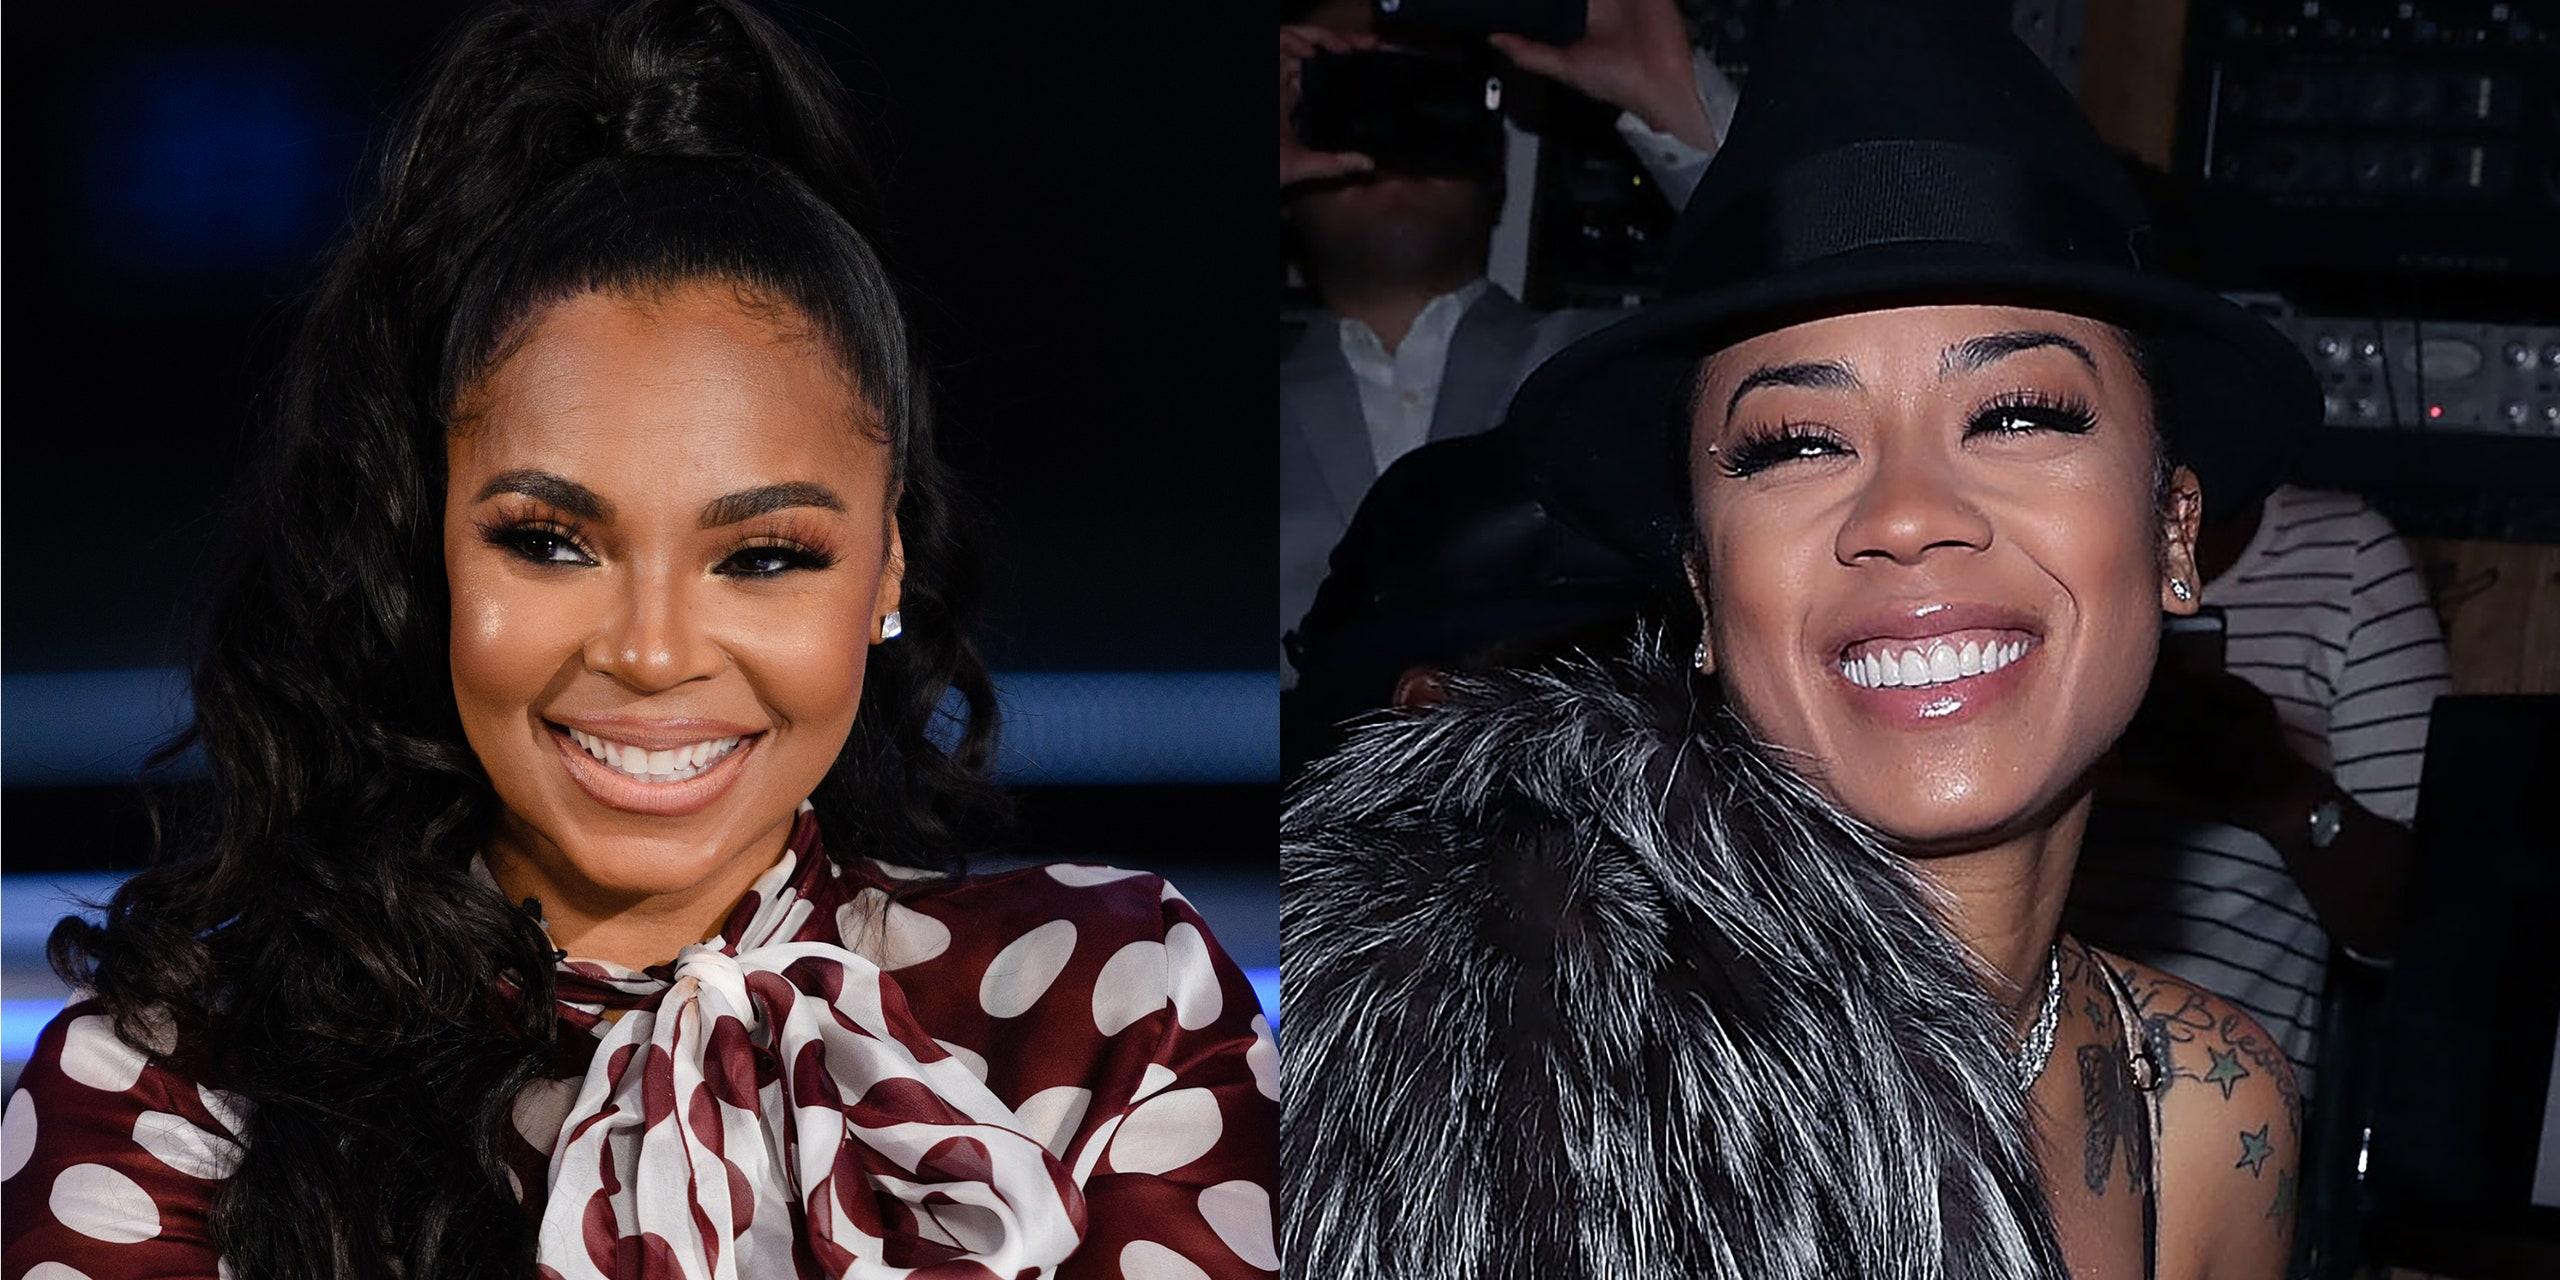 Verzuz Battle: Ladies Night With Ashanti vs. Keyshia Cole